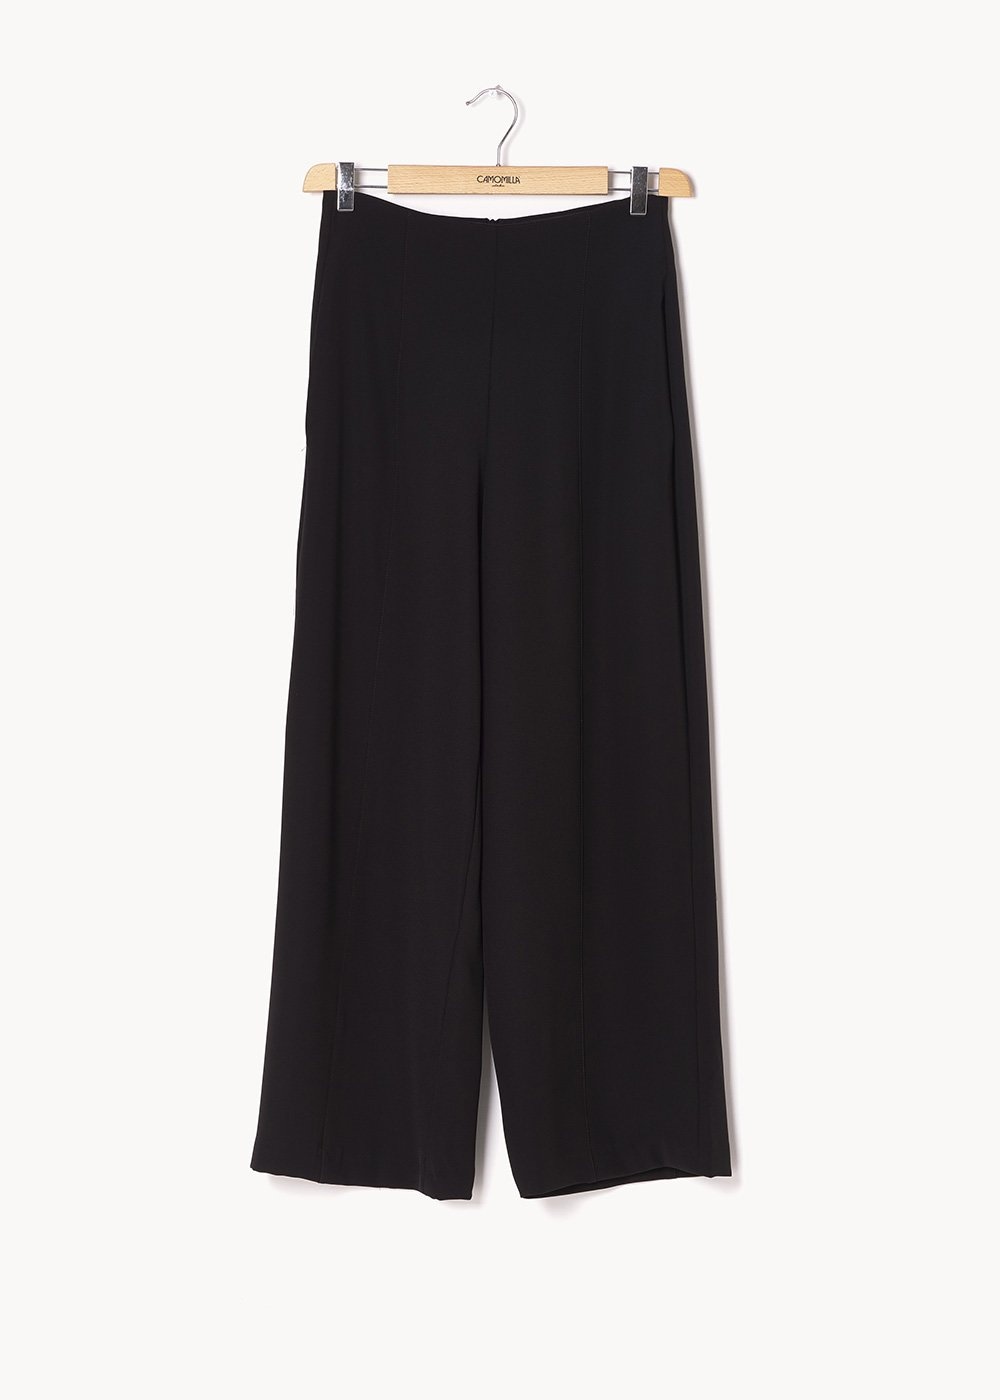 Pantalone Pamel in tessuto cady - Black - Donna